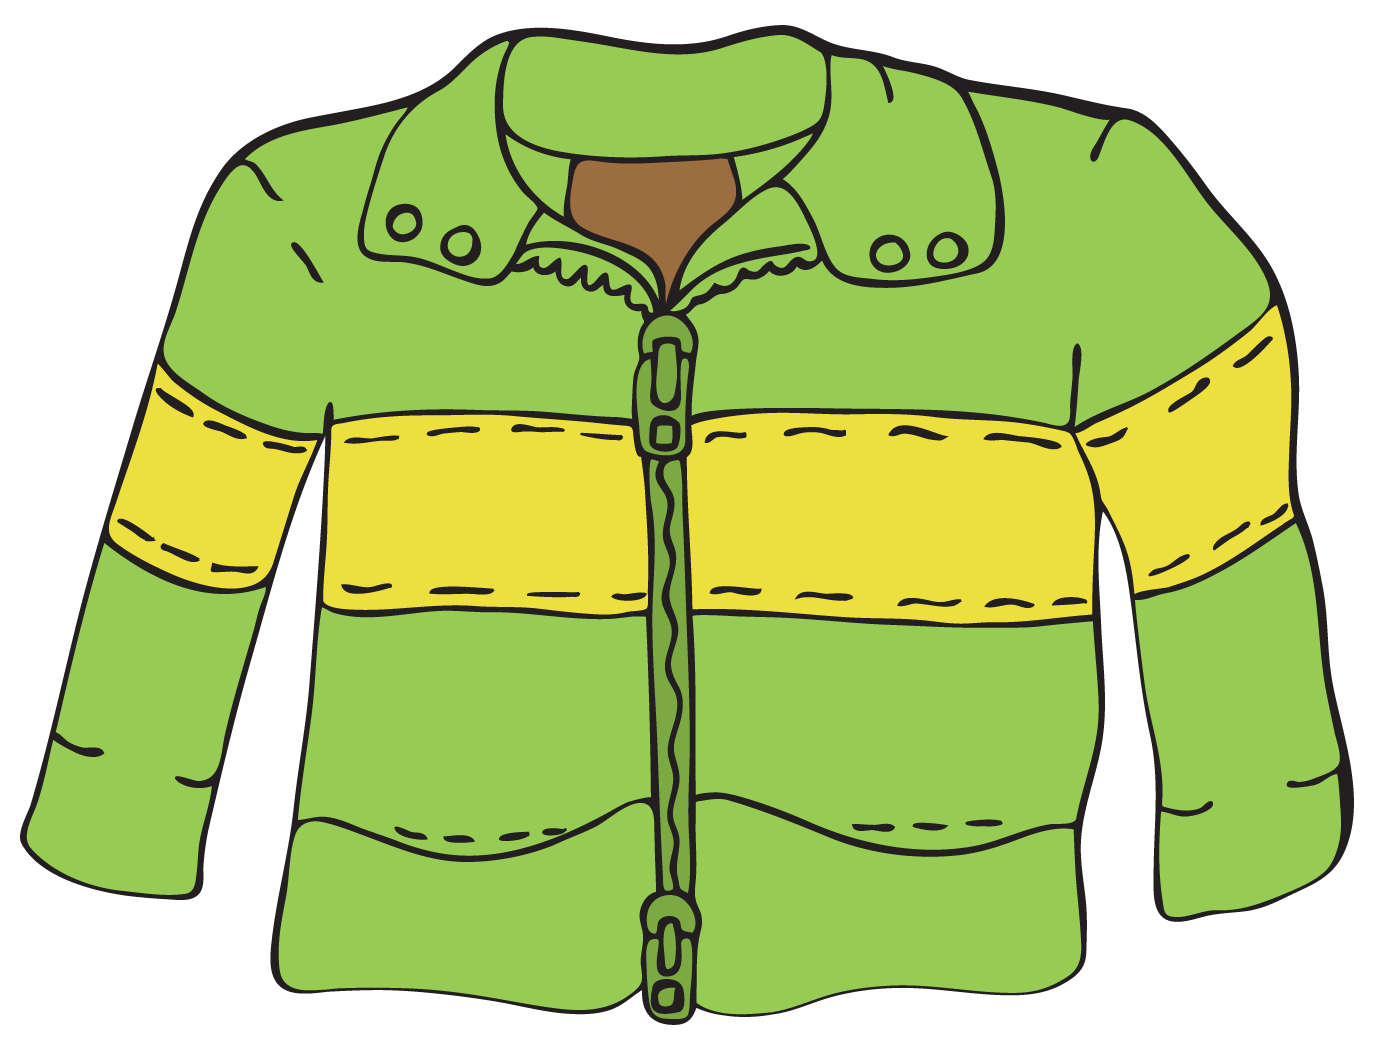 Coat clipart image image Free Coats Cliparts, Download Free Clip Art, Free Clip Art on ... image